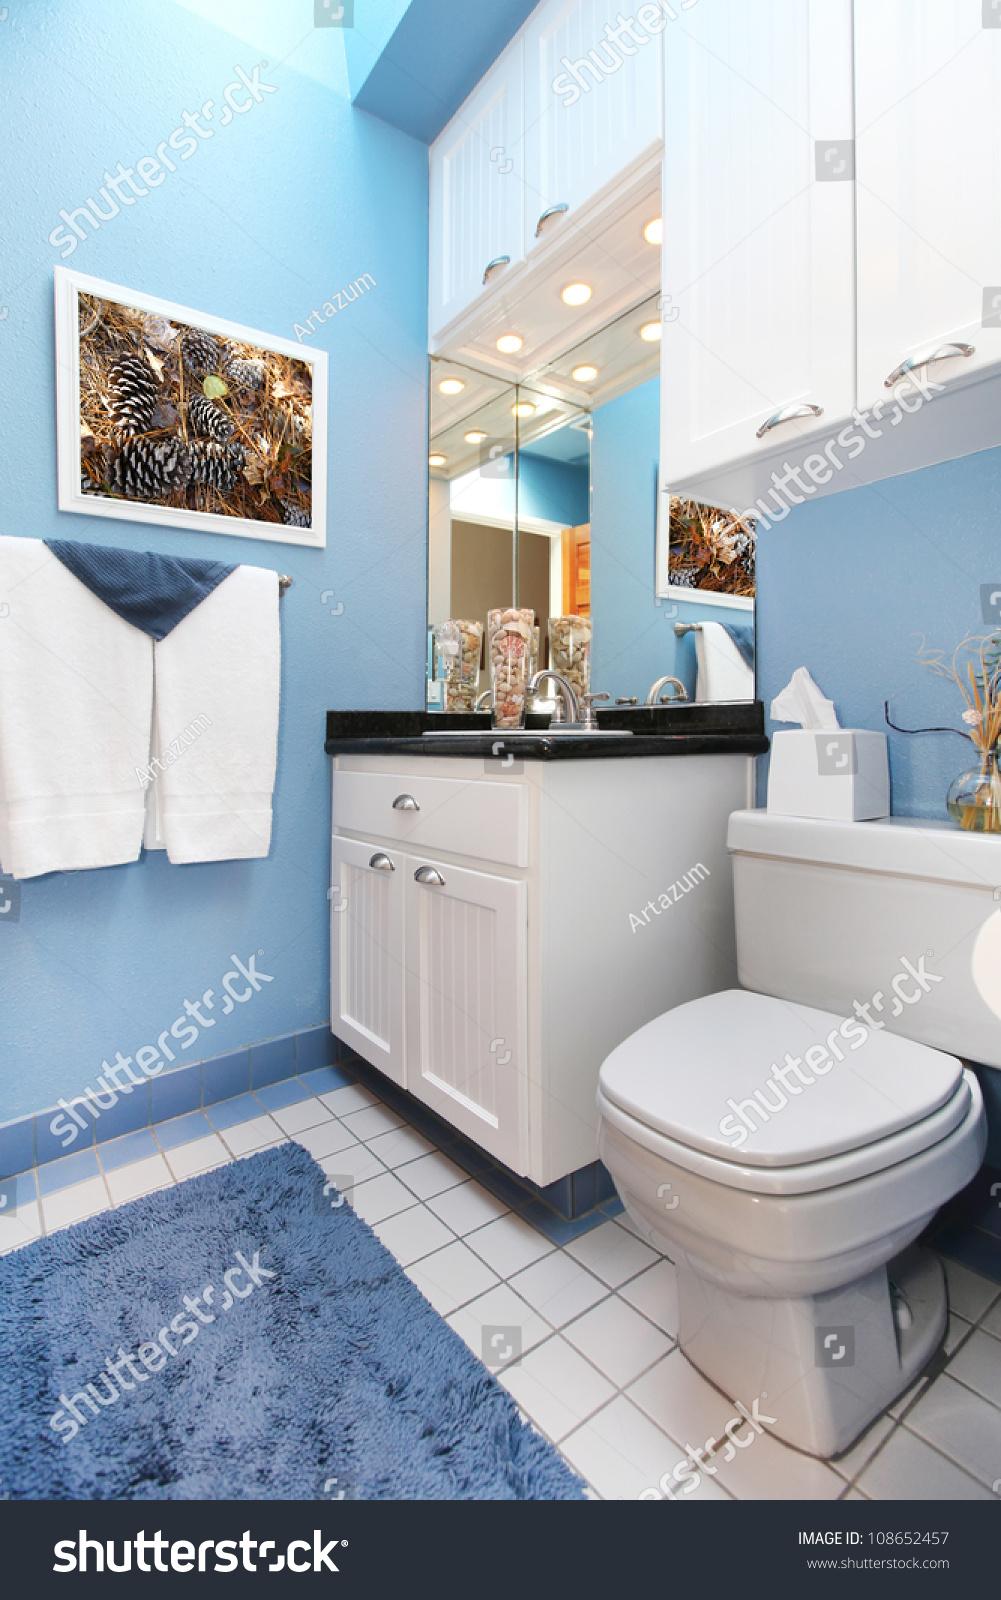 Bathroom White Cabinets Bathroom Interior Blue Walls White Cabinets Stock Photo 108652457